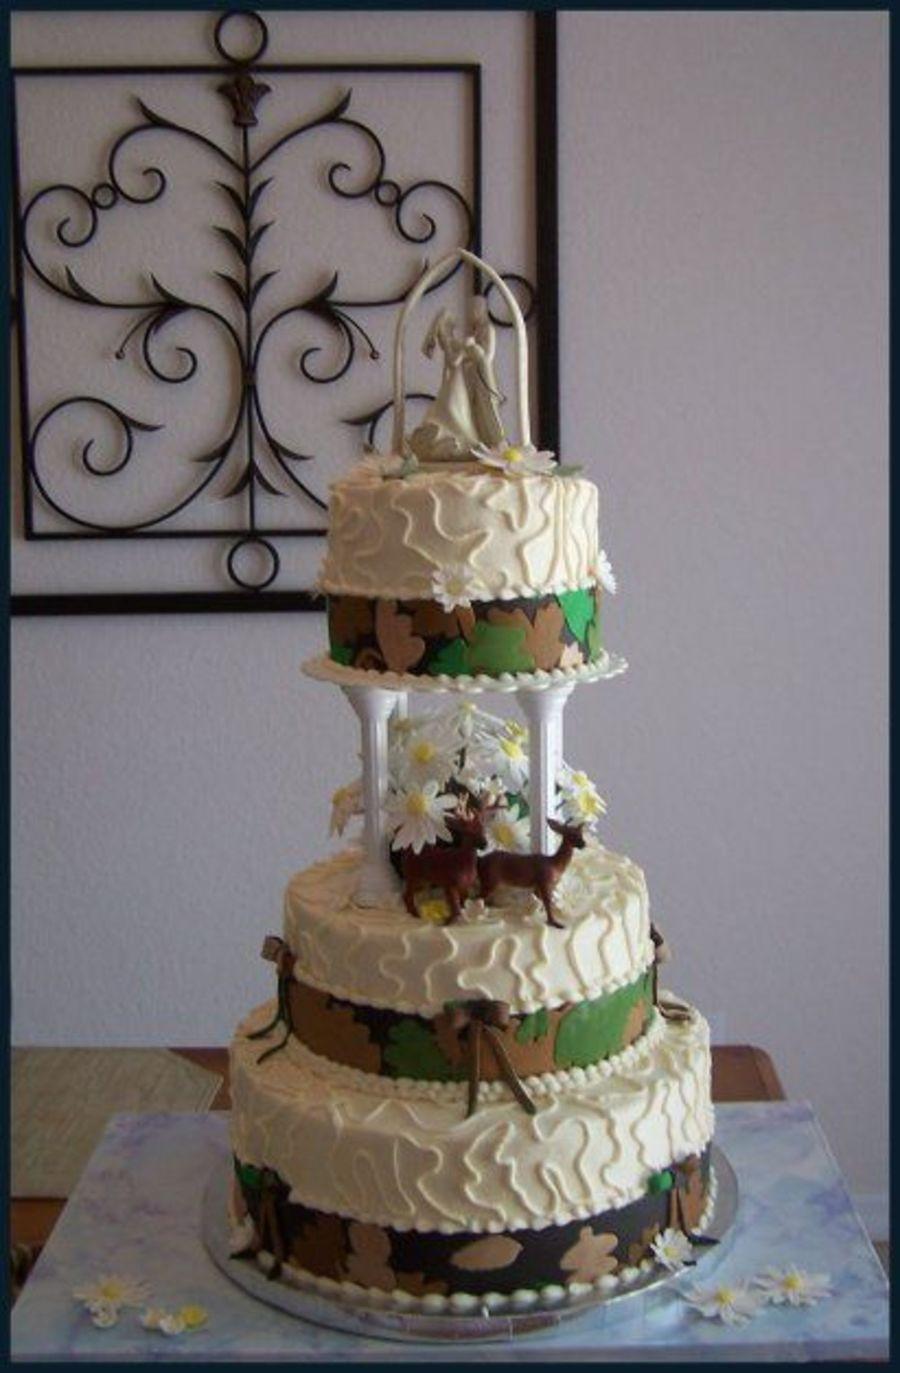 Hunting Wedding Cakes  Camouflage Wedding Cake CakeCentral